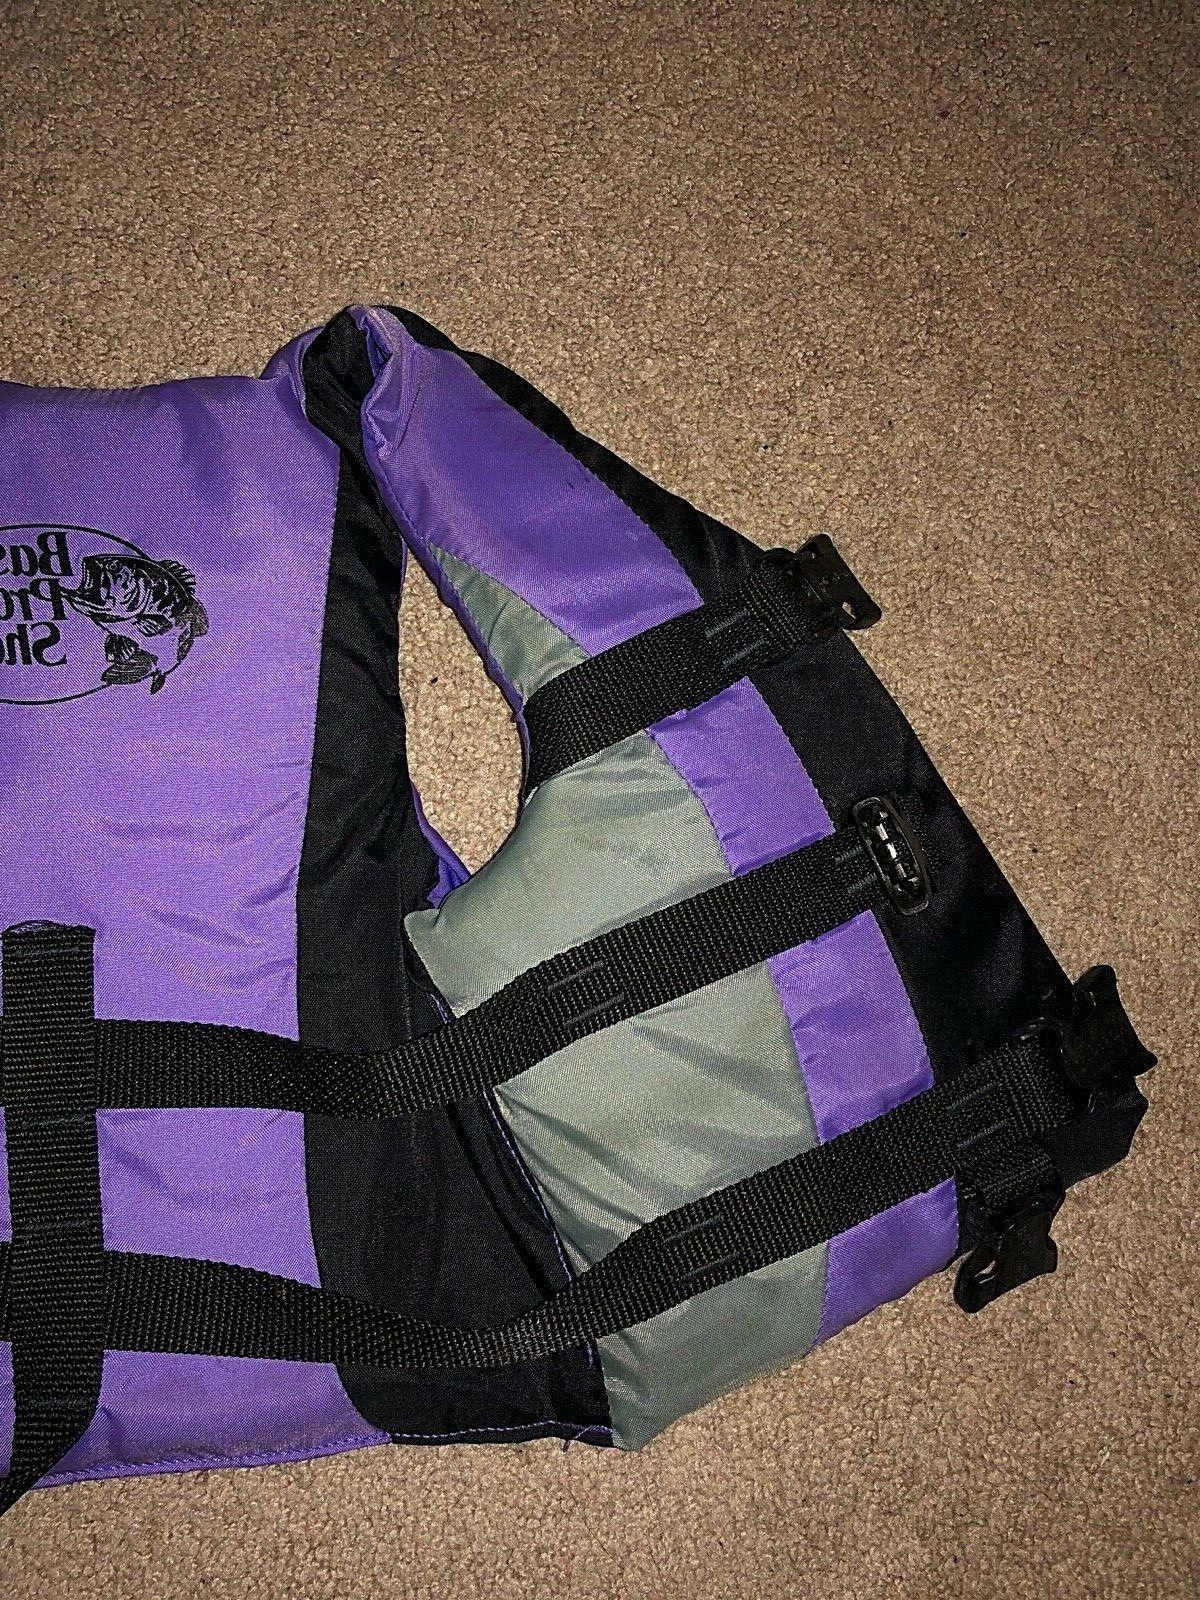 Youth Type 3 Purple Preserver Vest Bass Shops